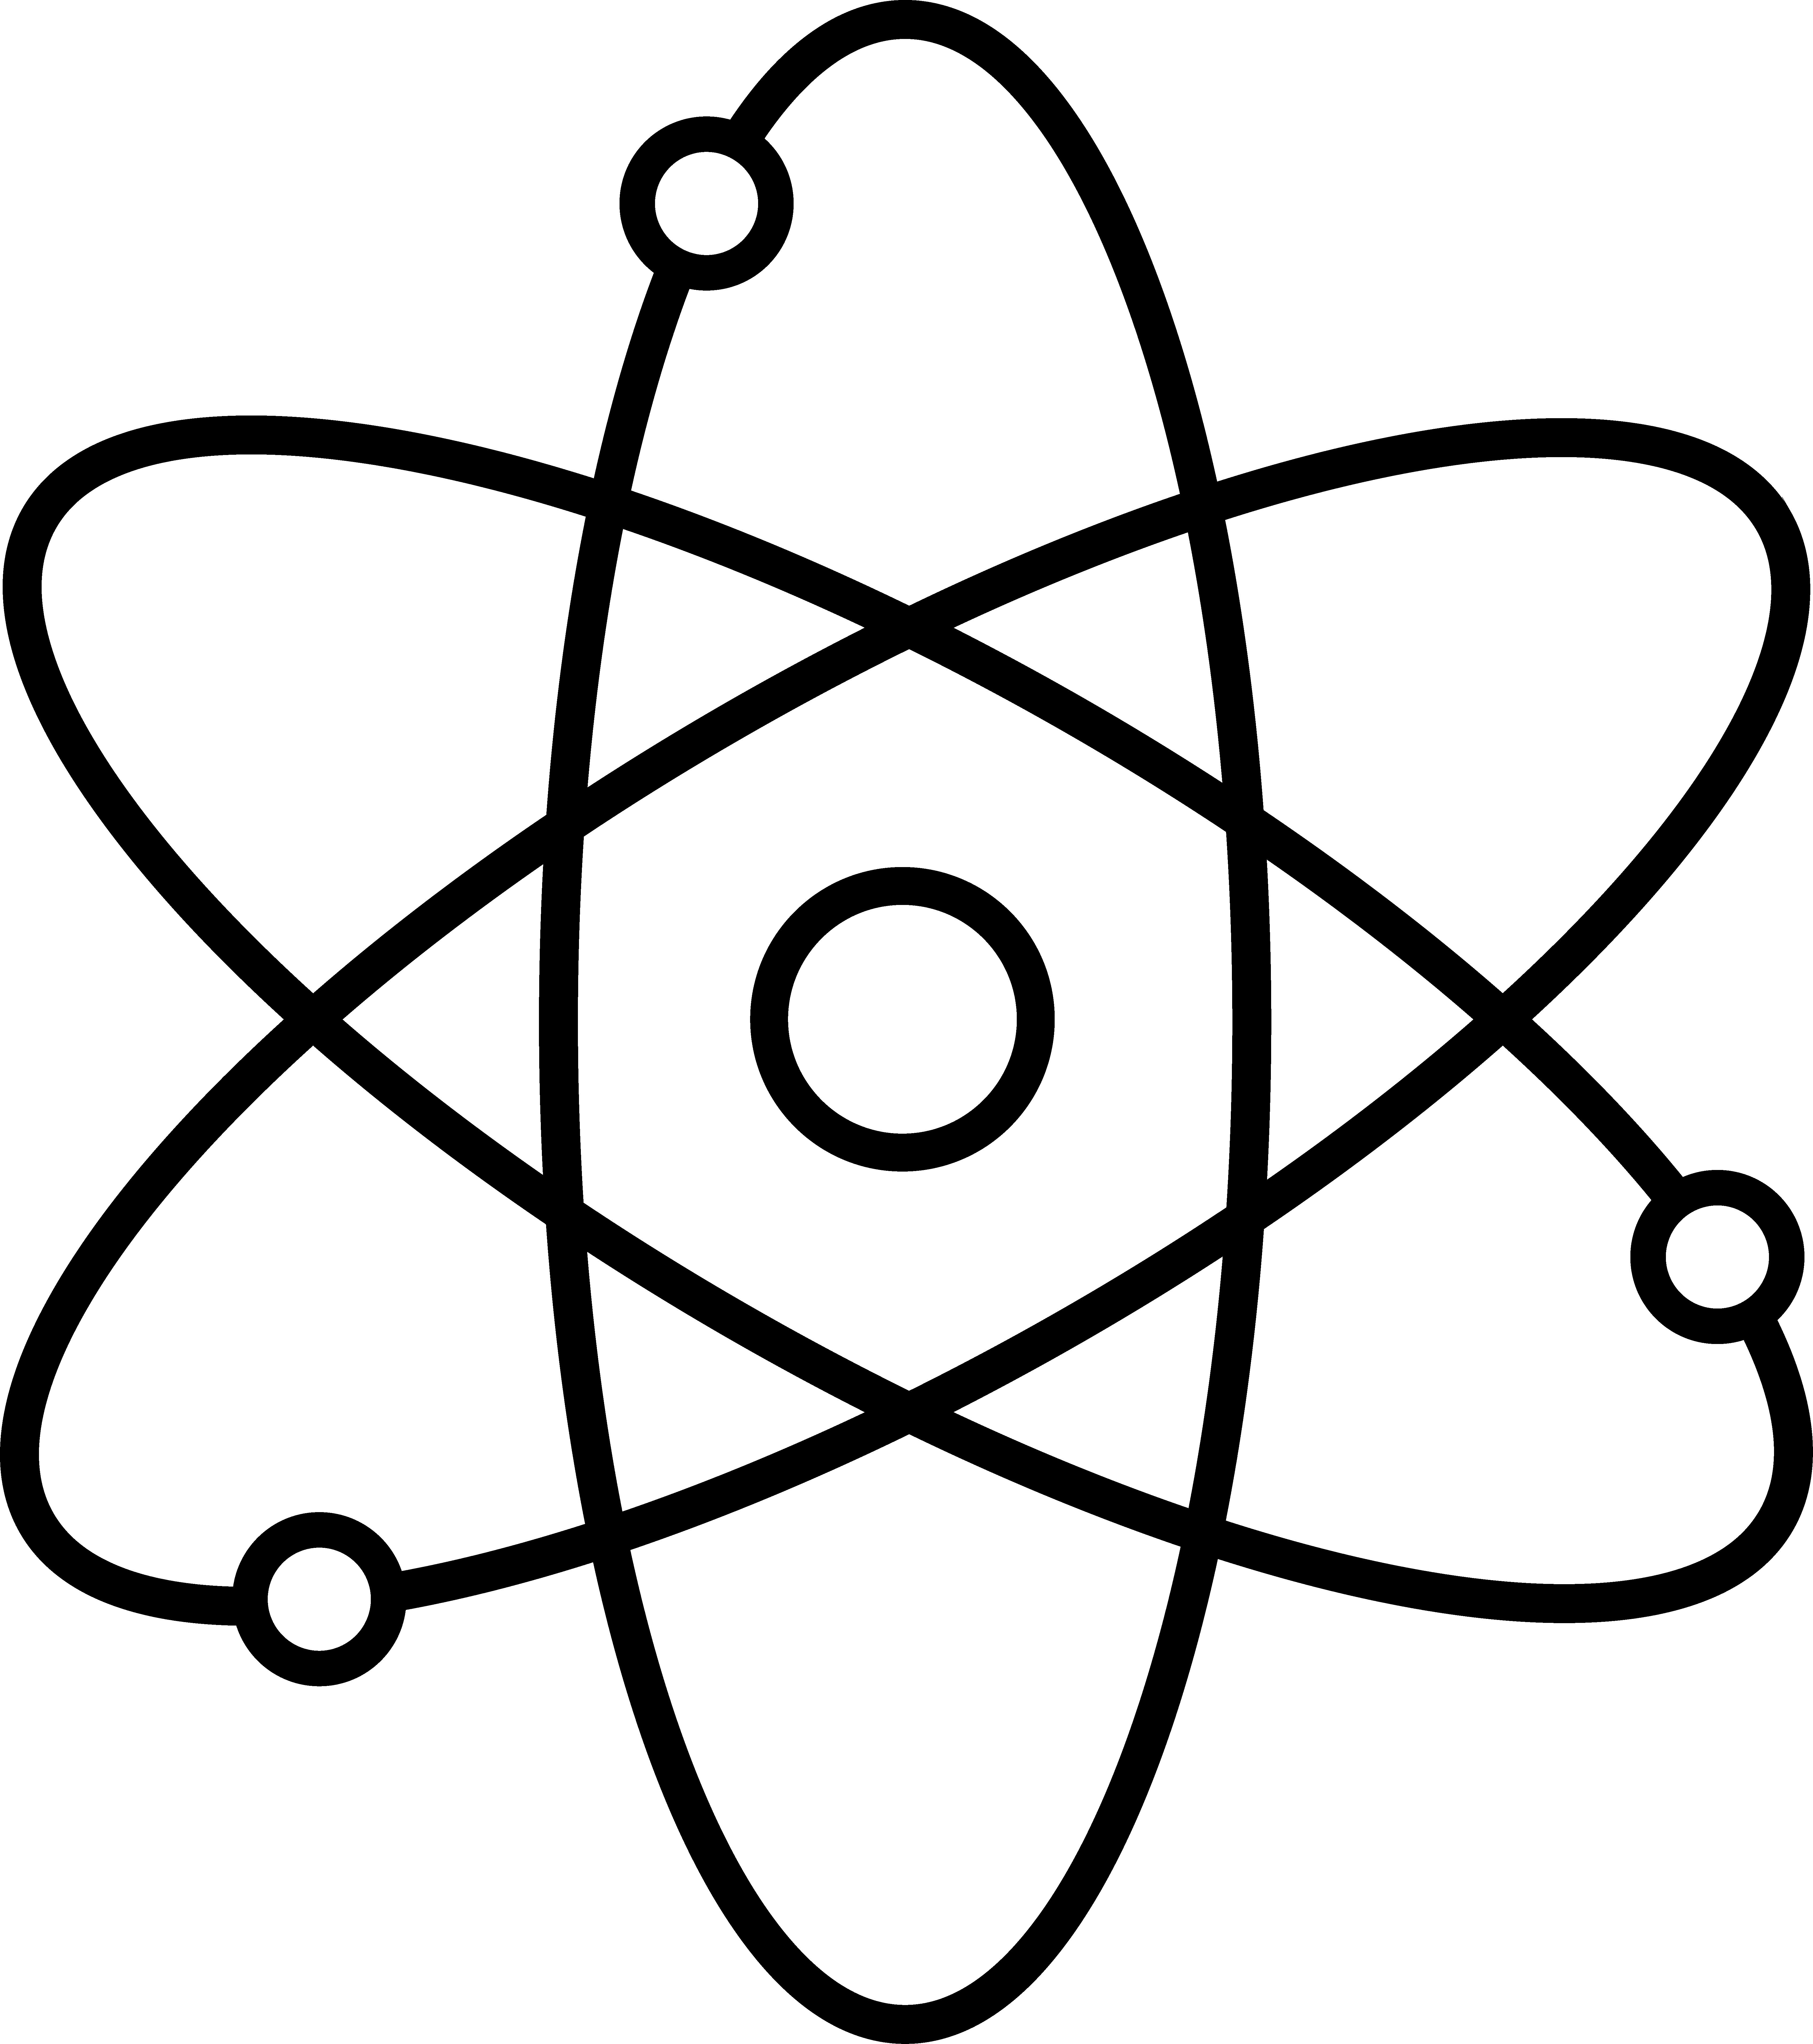 Half sun black and white clipart vector vector black and white library Free Science Cliparts Black, Download Free Clip Art, Free Clip Art ... vector black and white library